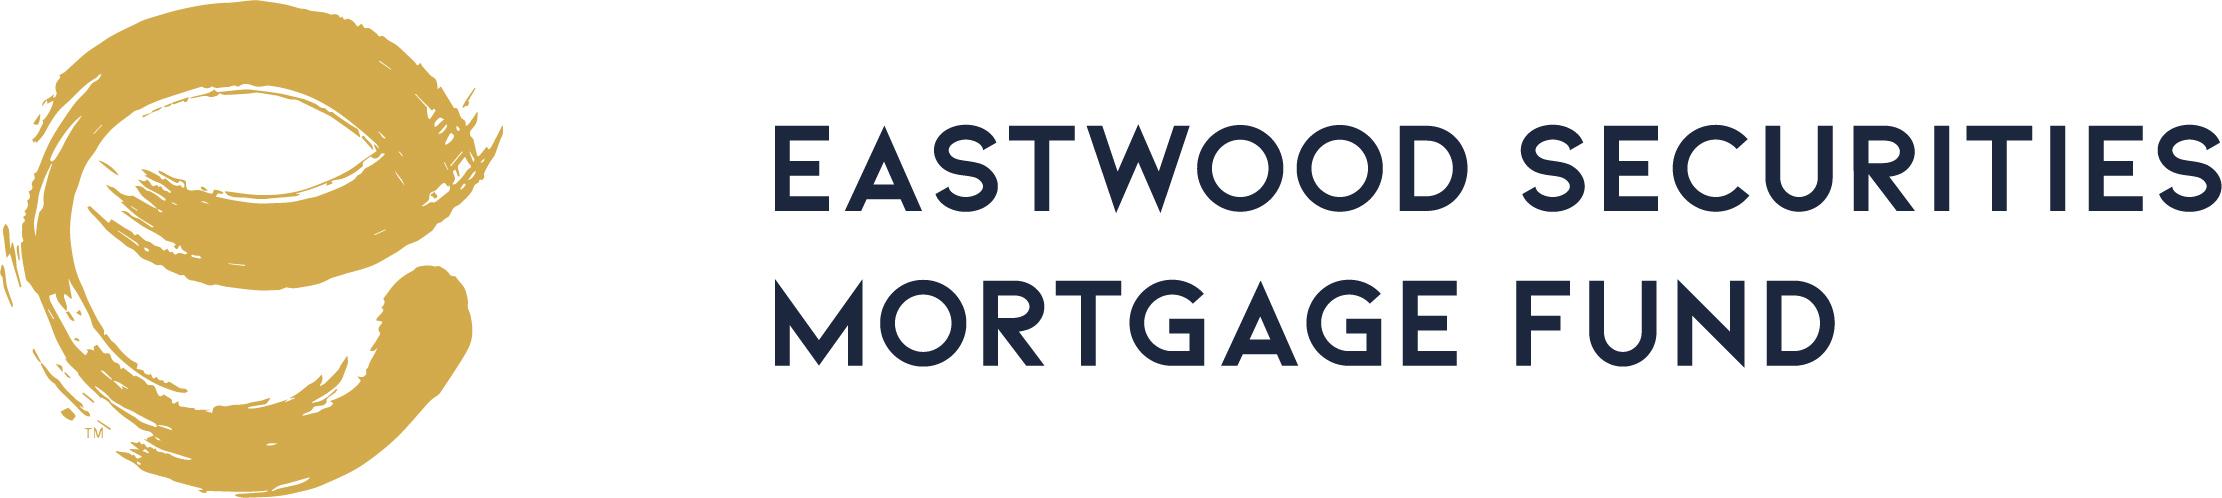 EastwoodSecurities Logo